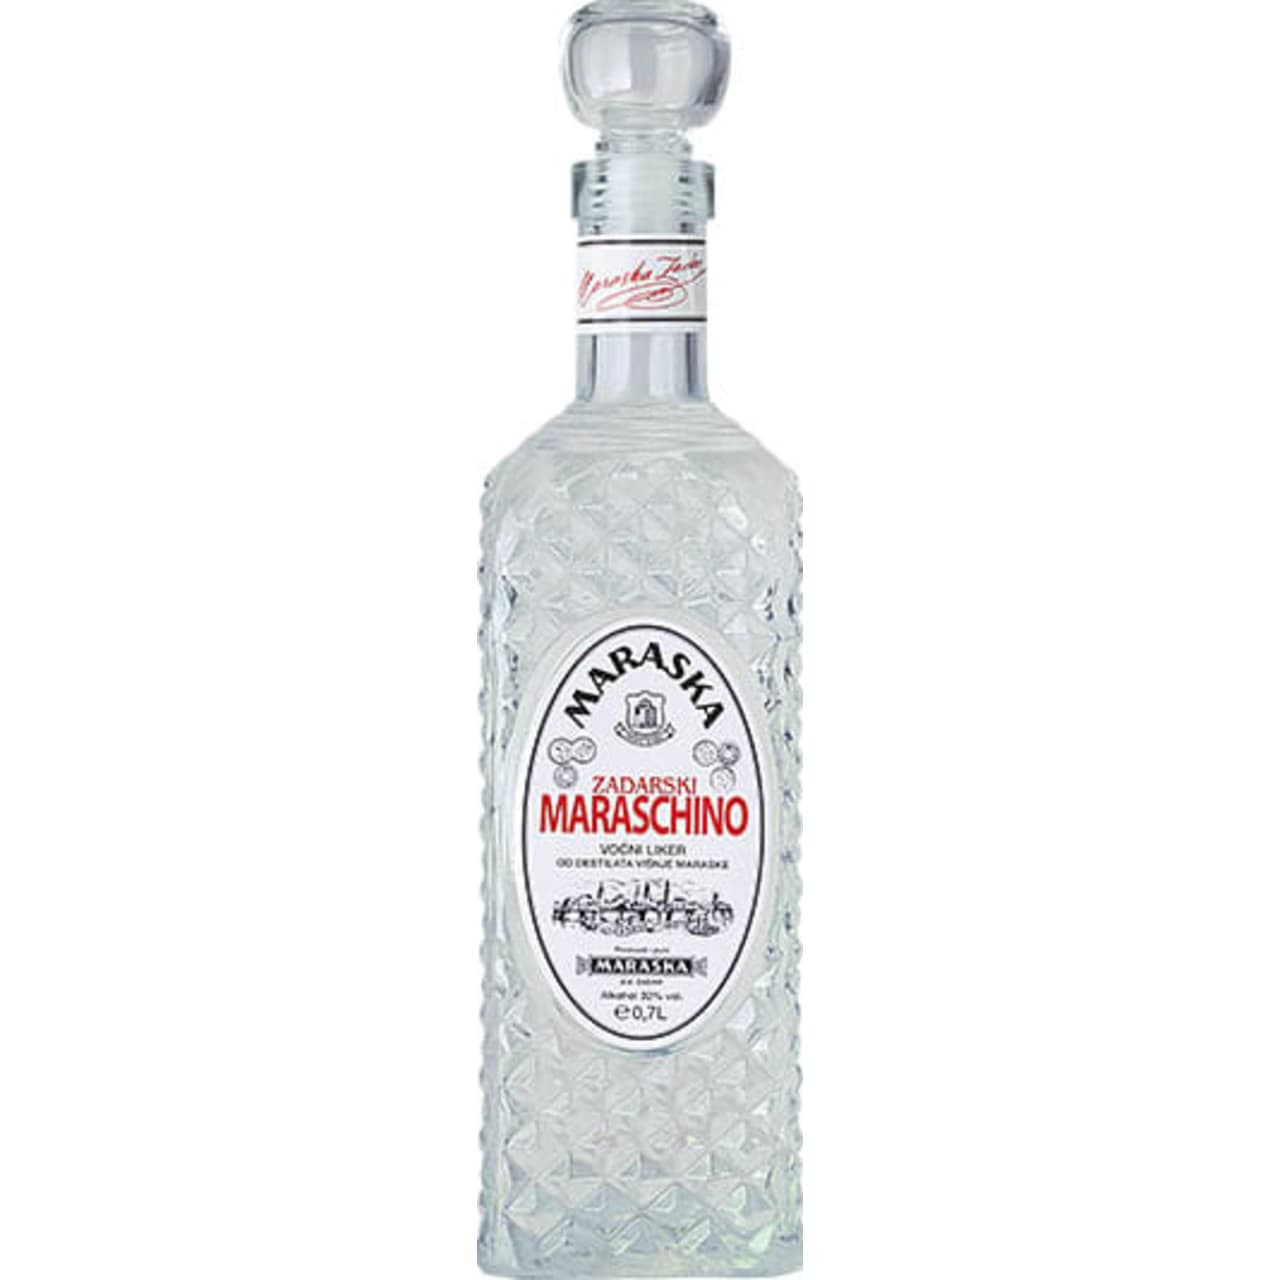 Product Image - Maraska Maraschino Liqueur